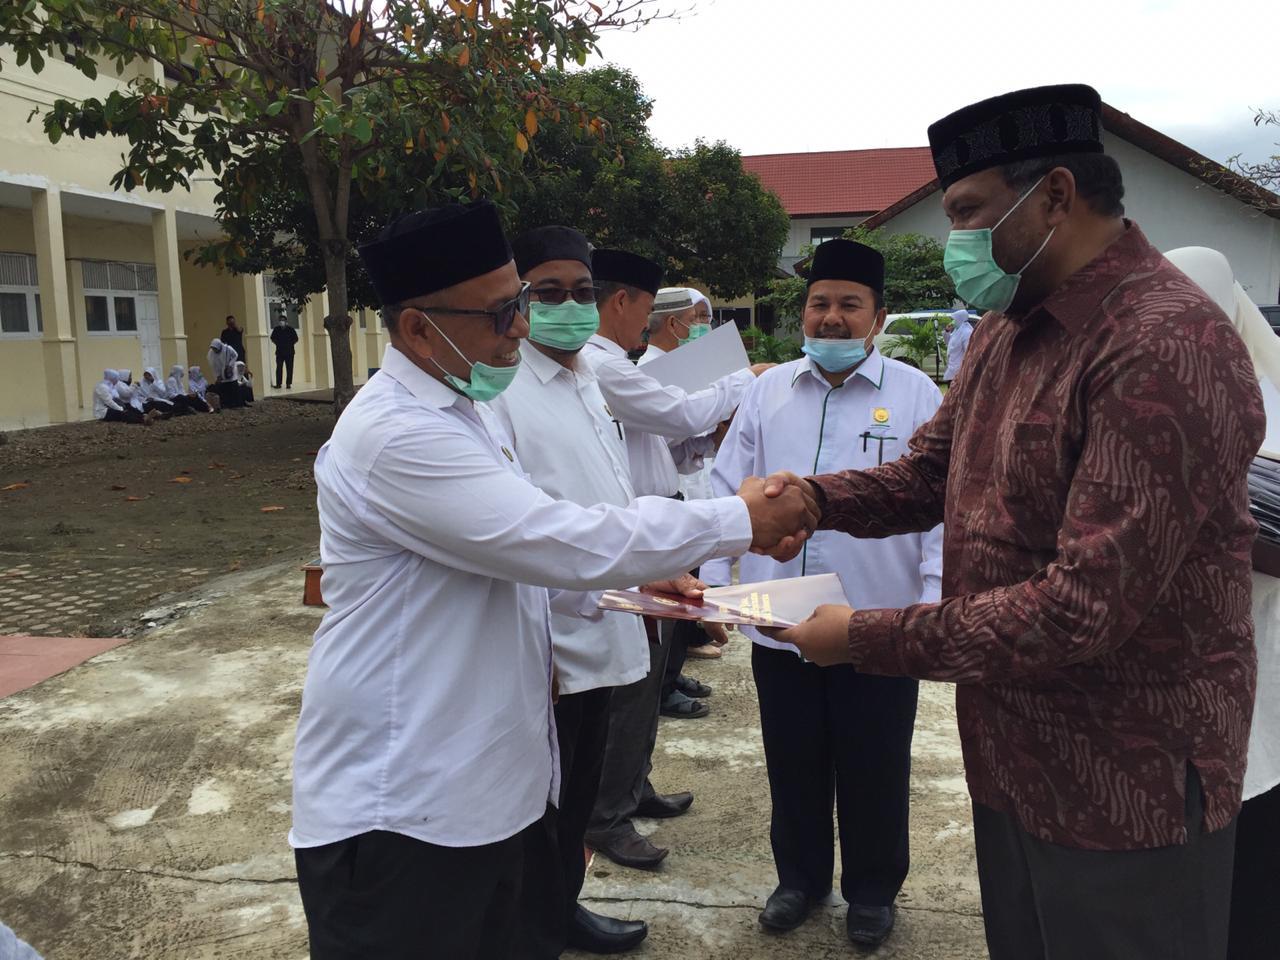 Puluhan Tahun Mengabdi, Wakil Walikota Serahkan Penghargaan kepada PNS Kankemenag